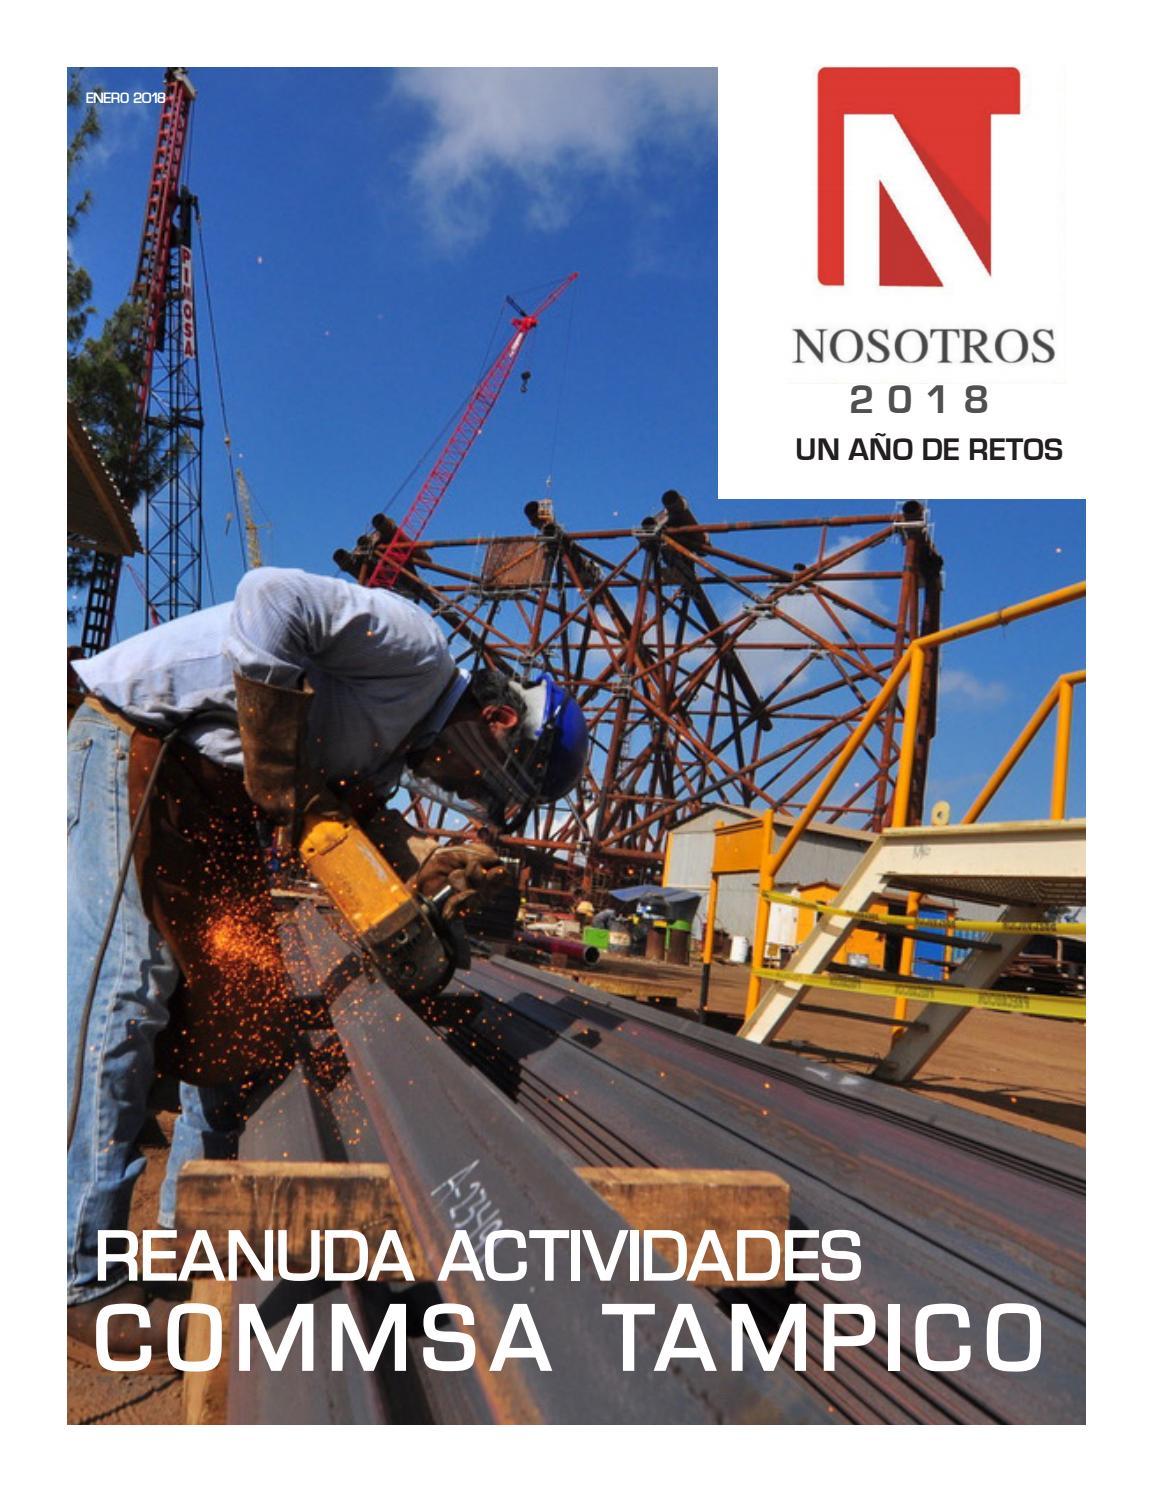 Revista Nosotros Enero 2018 by GrupoIndustrialMonclova - issuu